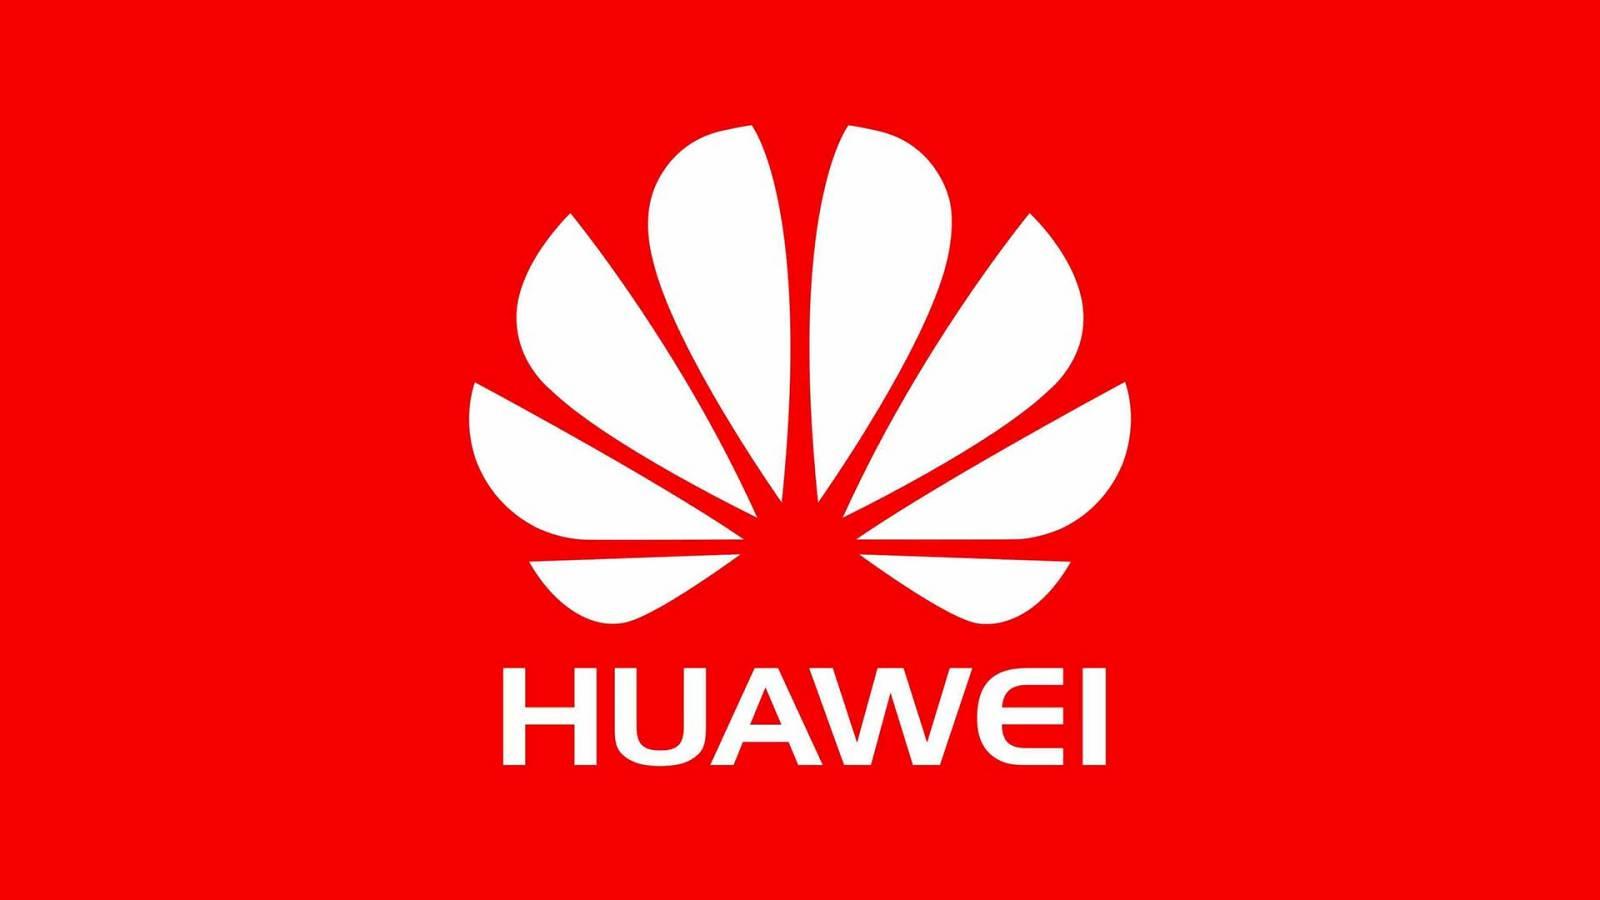 Huawei Vestea GROZAVA pentru Telefoane si TOTI Clientii